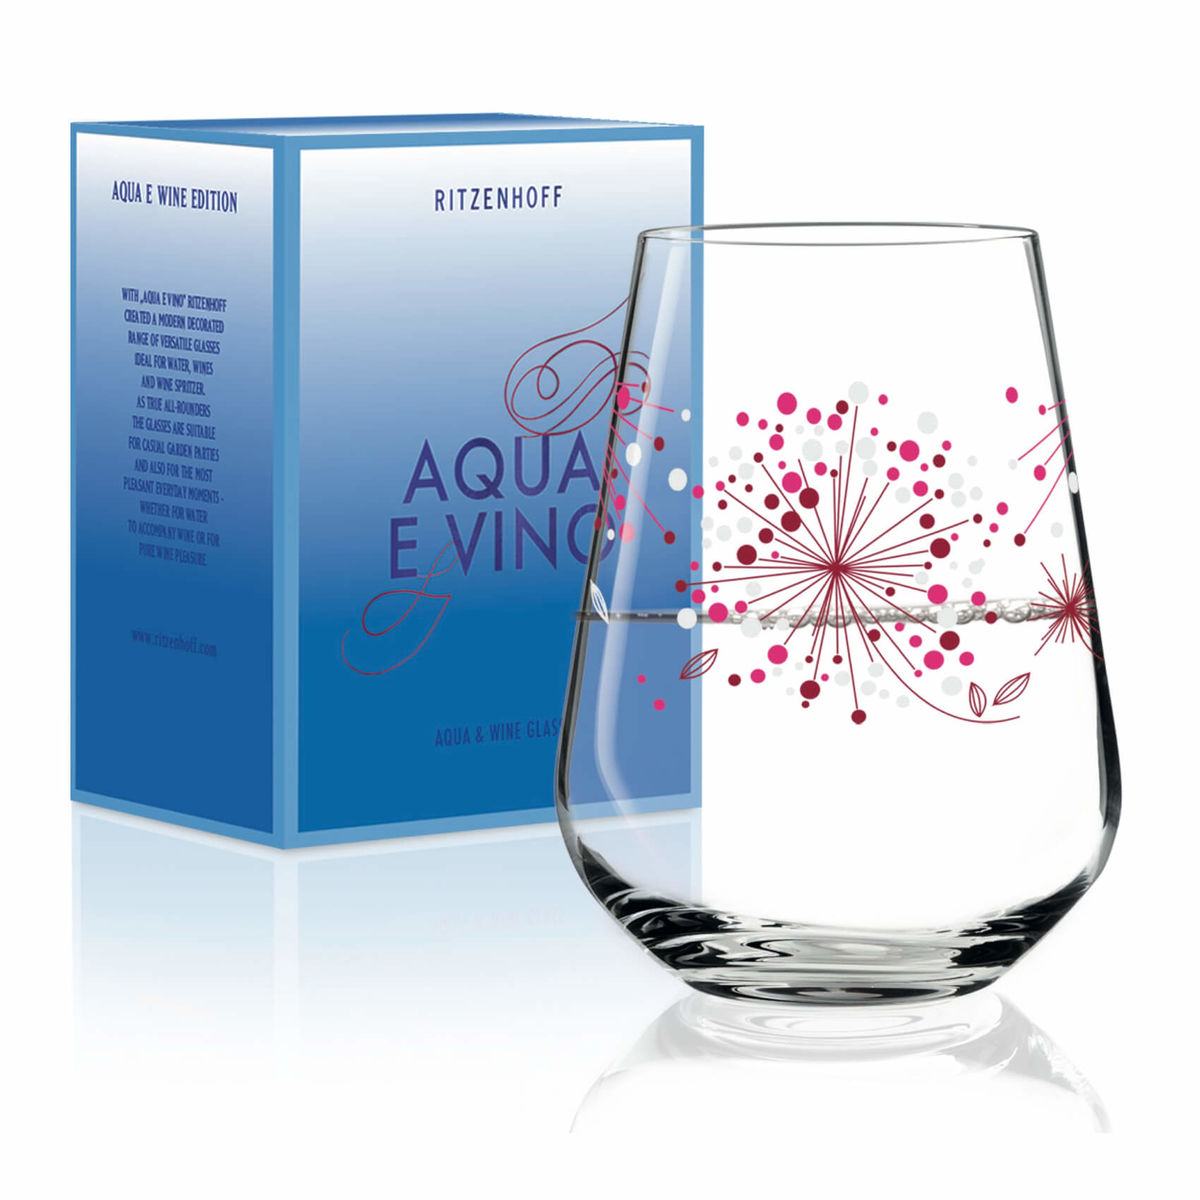 Ritzenhoff Véronique Jacquart 2018 Aqua e Vino Wasser- und Weinglas